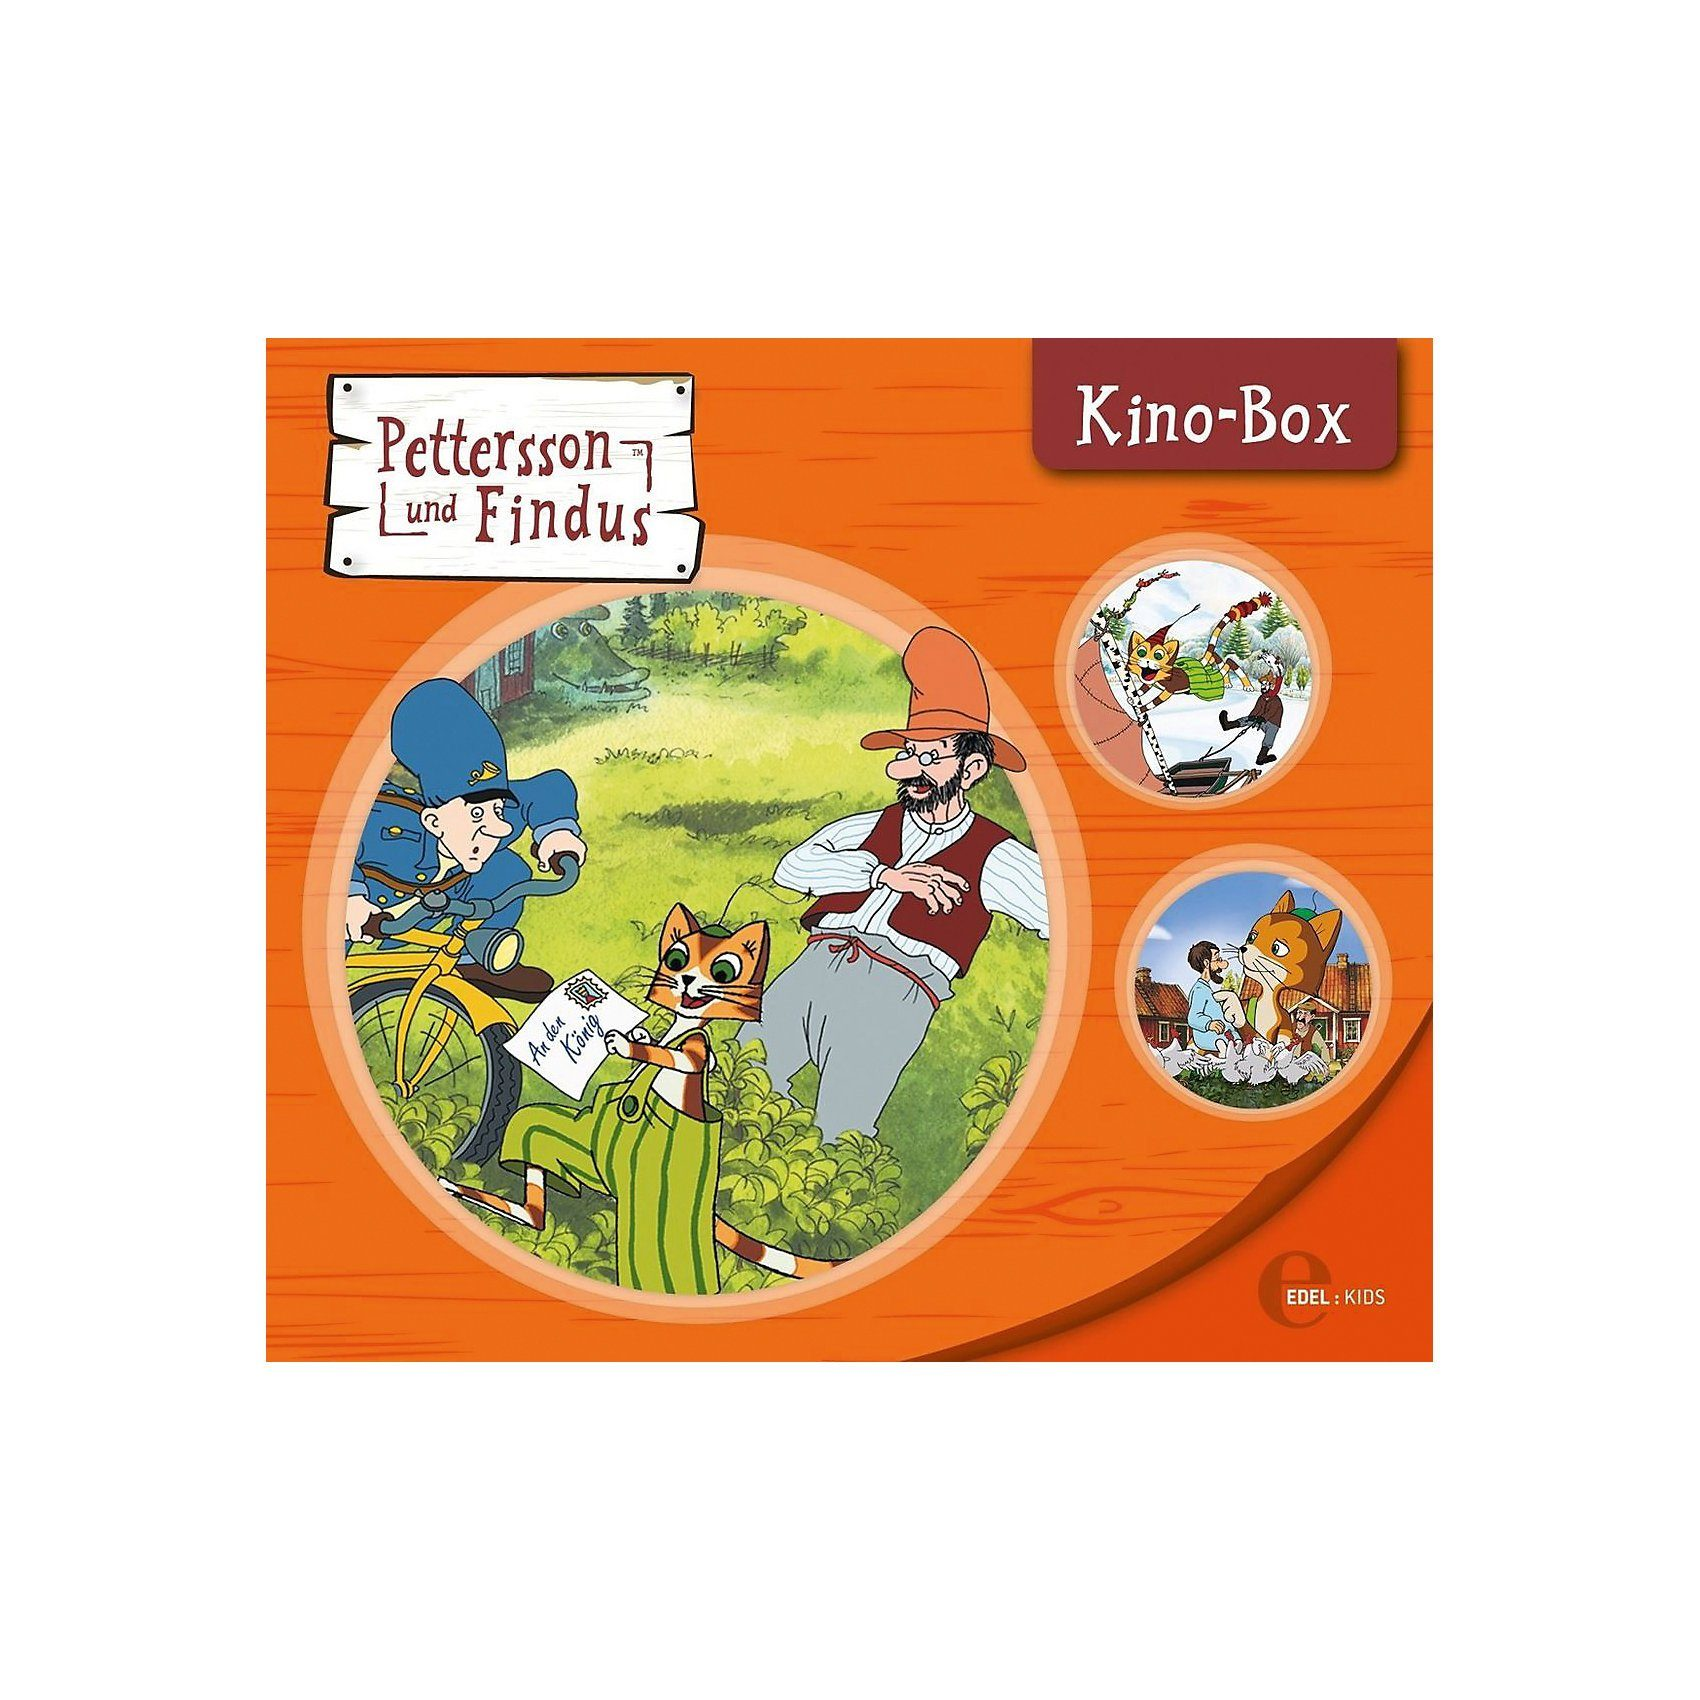 Edel CD Pettersson & Findus - Kinobox (3 CDs)